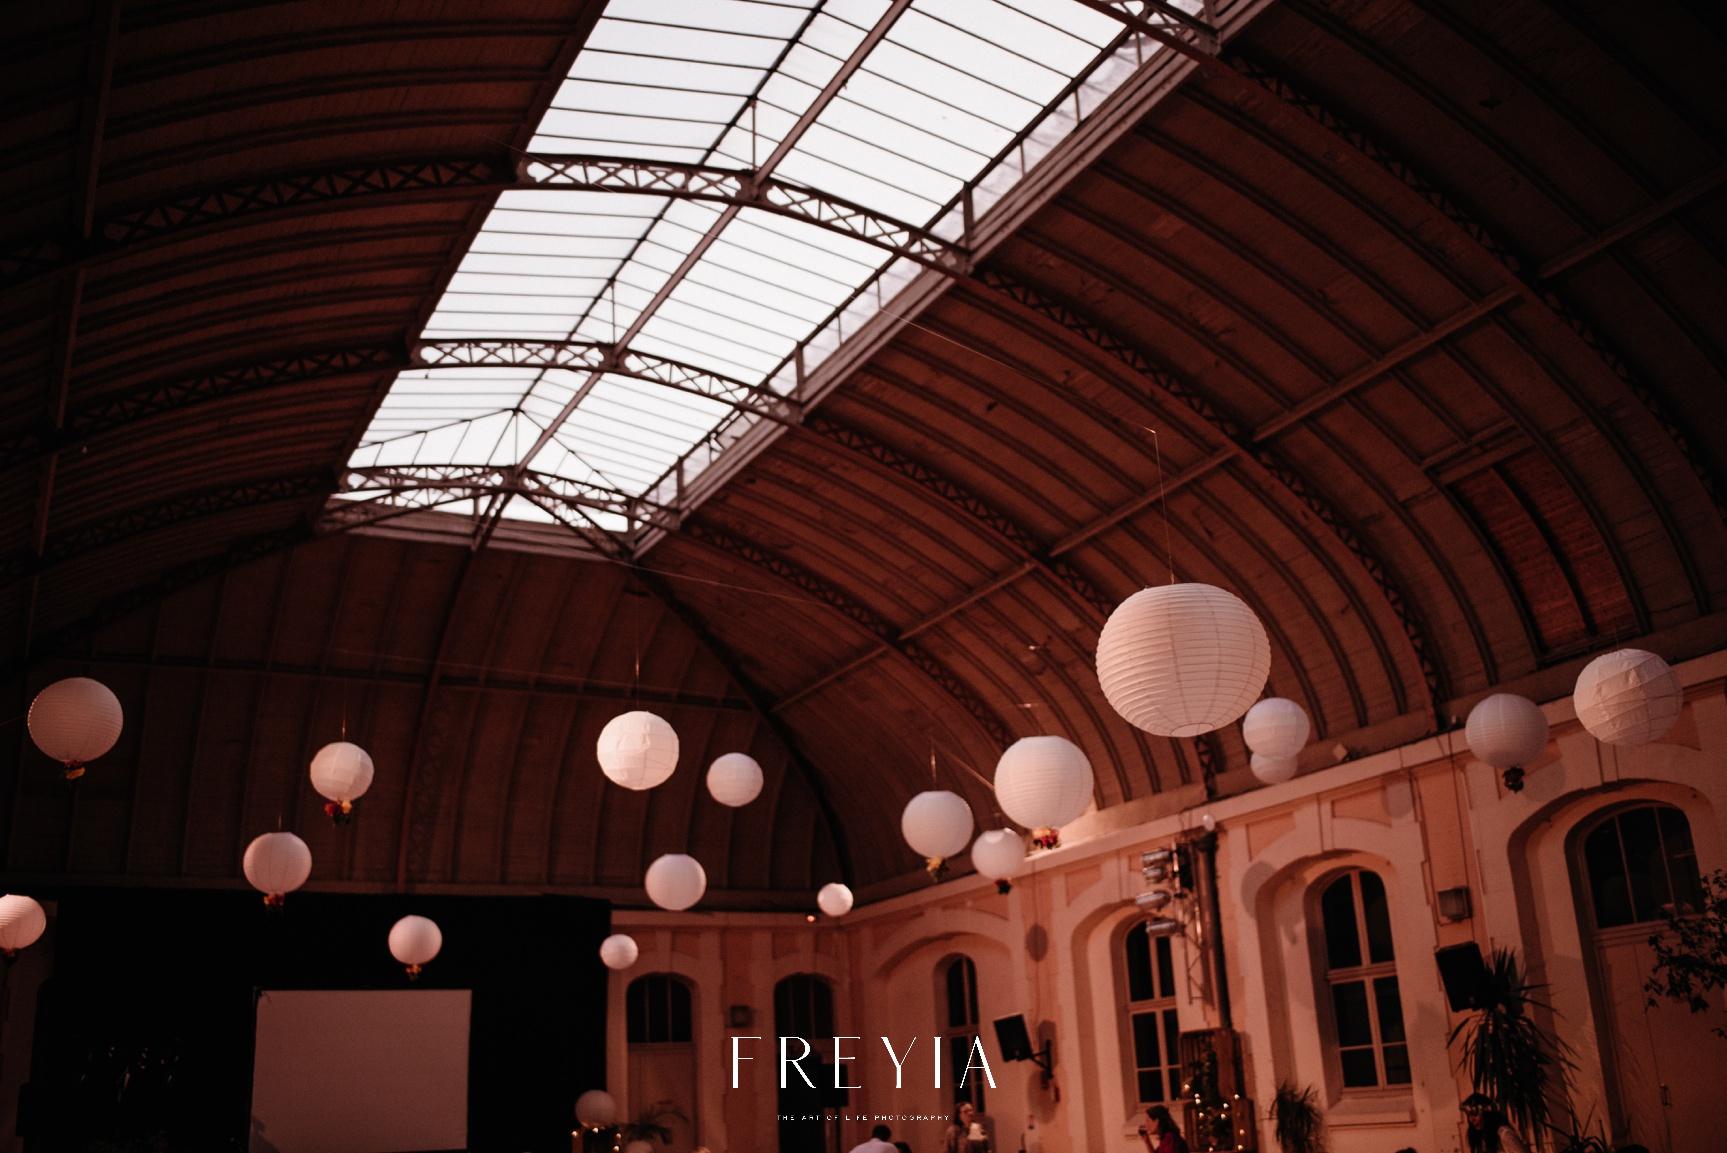 R + T |  mariage reportage alternatif moody intime minimaliste vintage naturel boho boheme |  PHOTOGRAPHE mariage PARIS france destination  | FREYIA photography_-354.jpg